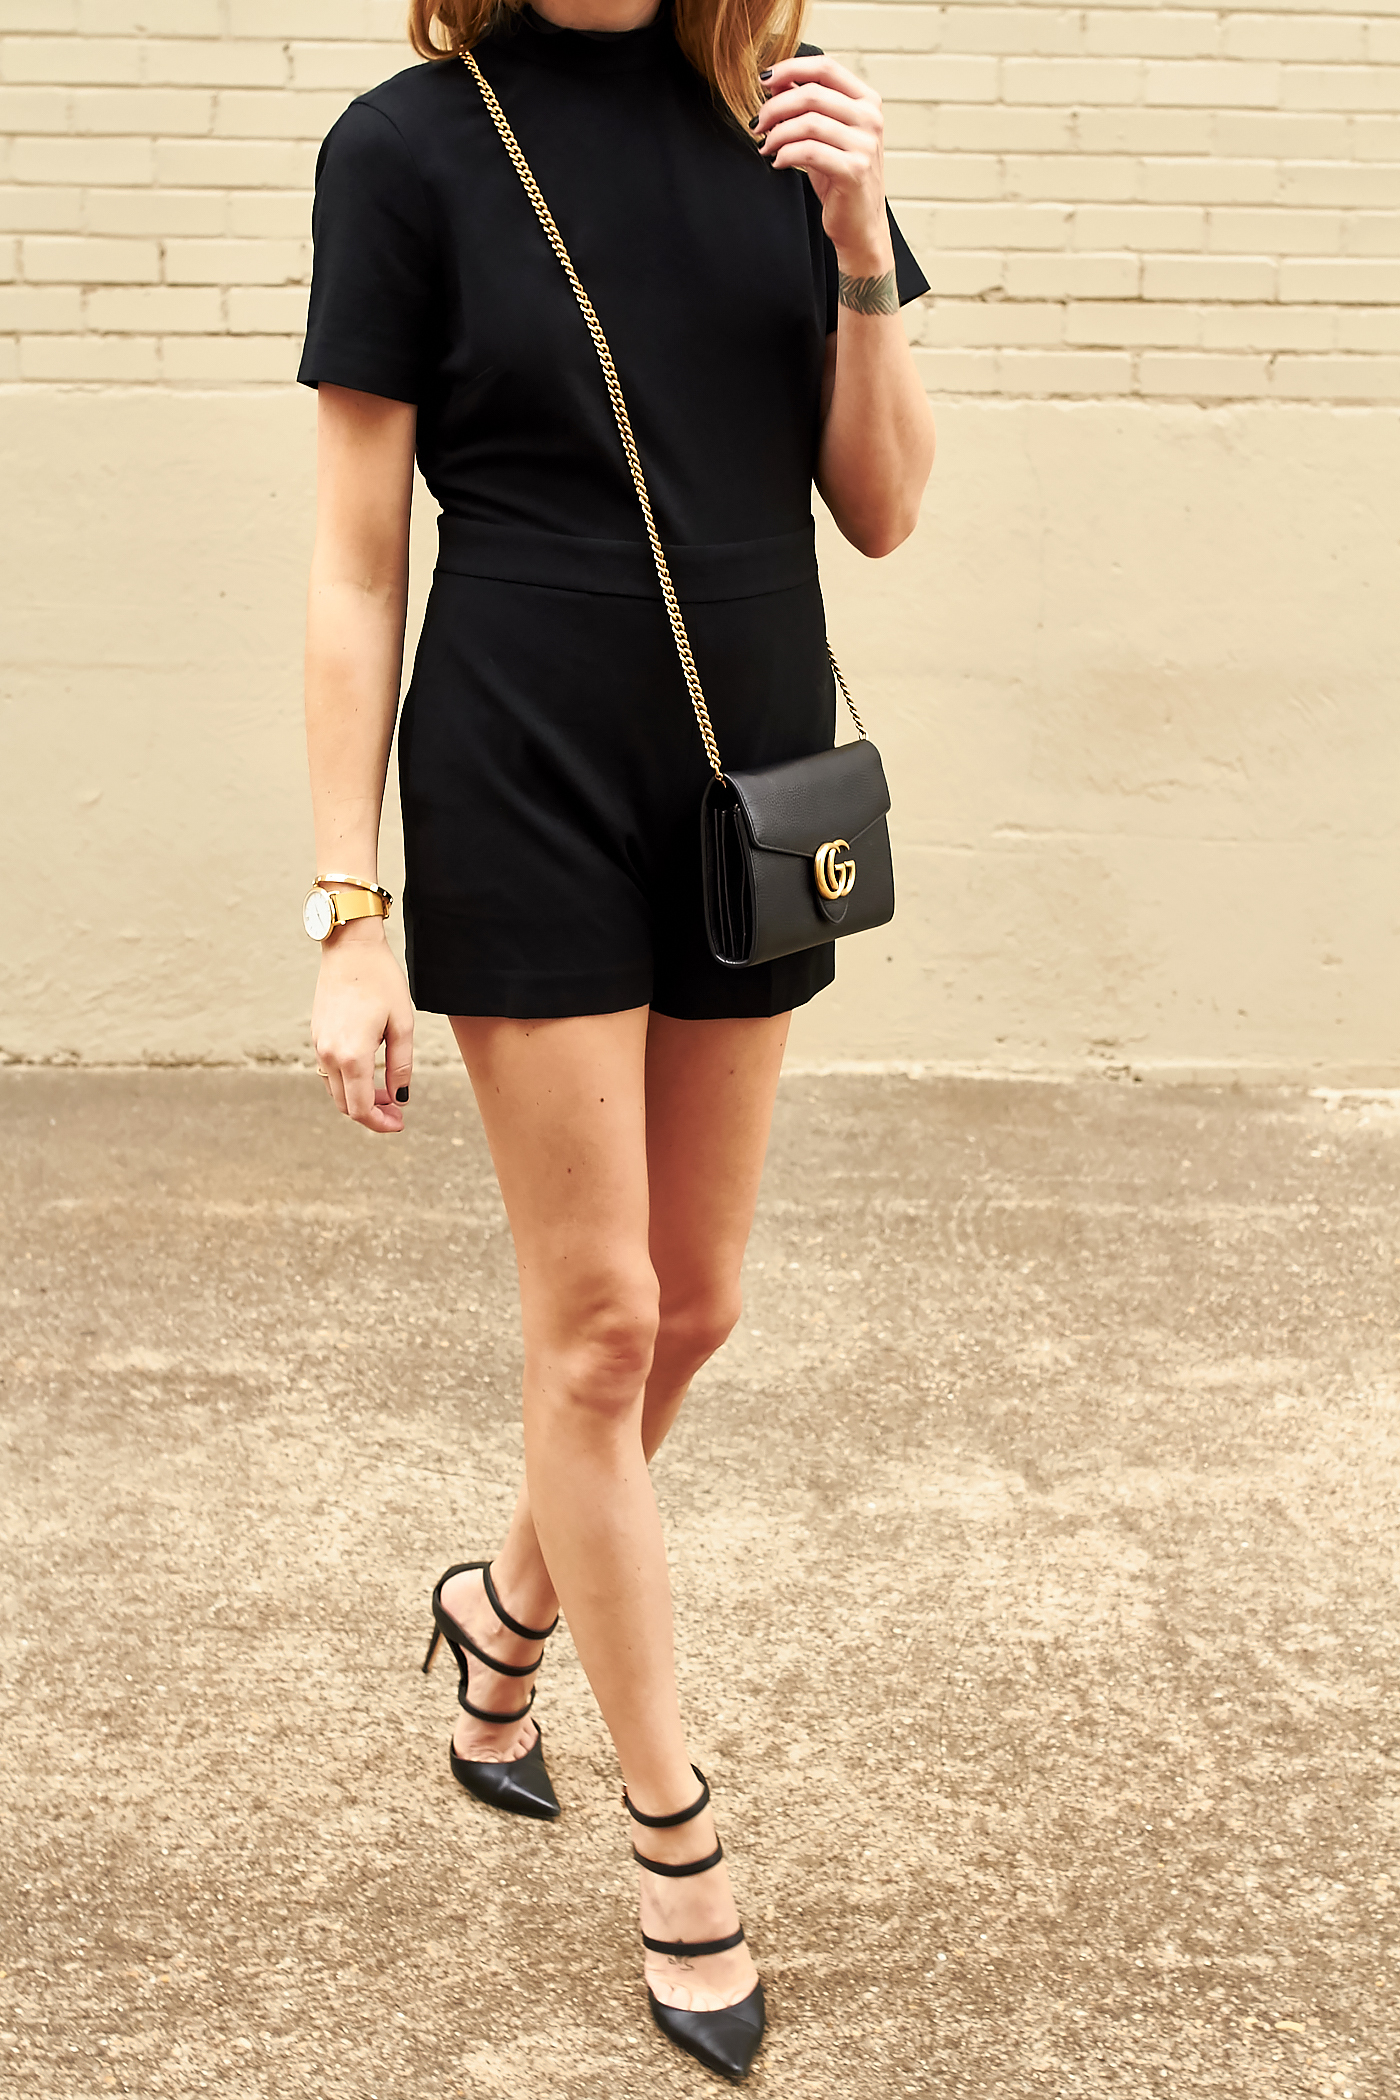 fashion-jackson-club-monaco-black-philena-romper-gucci-marmont-handbag-black-strappy-pumps